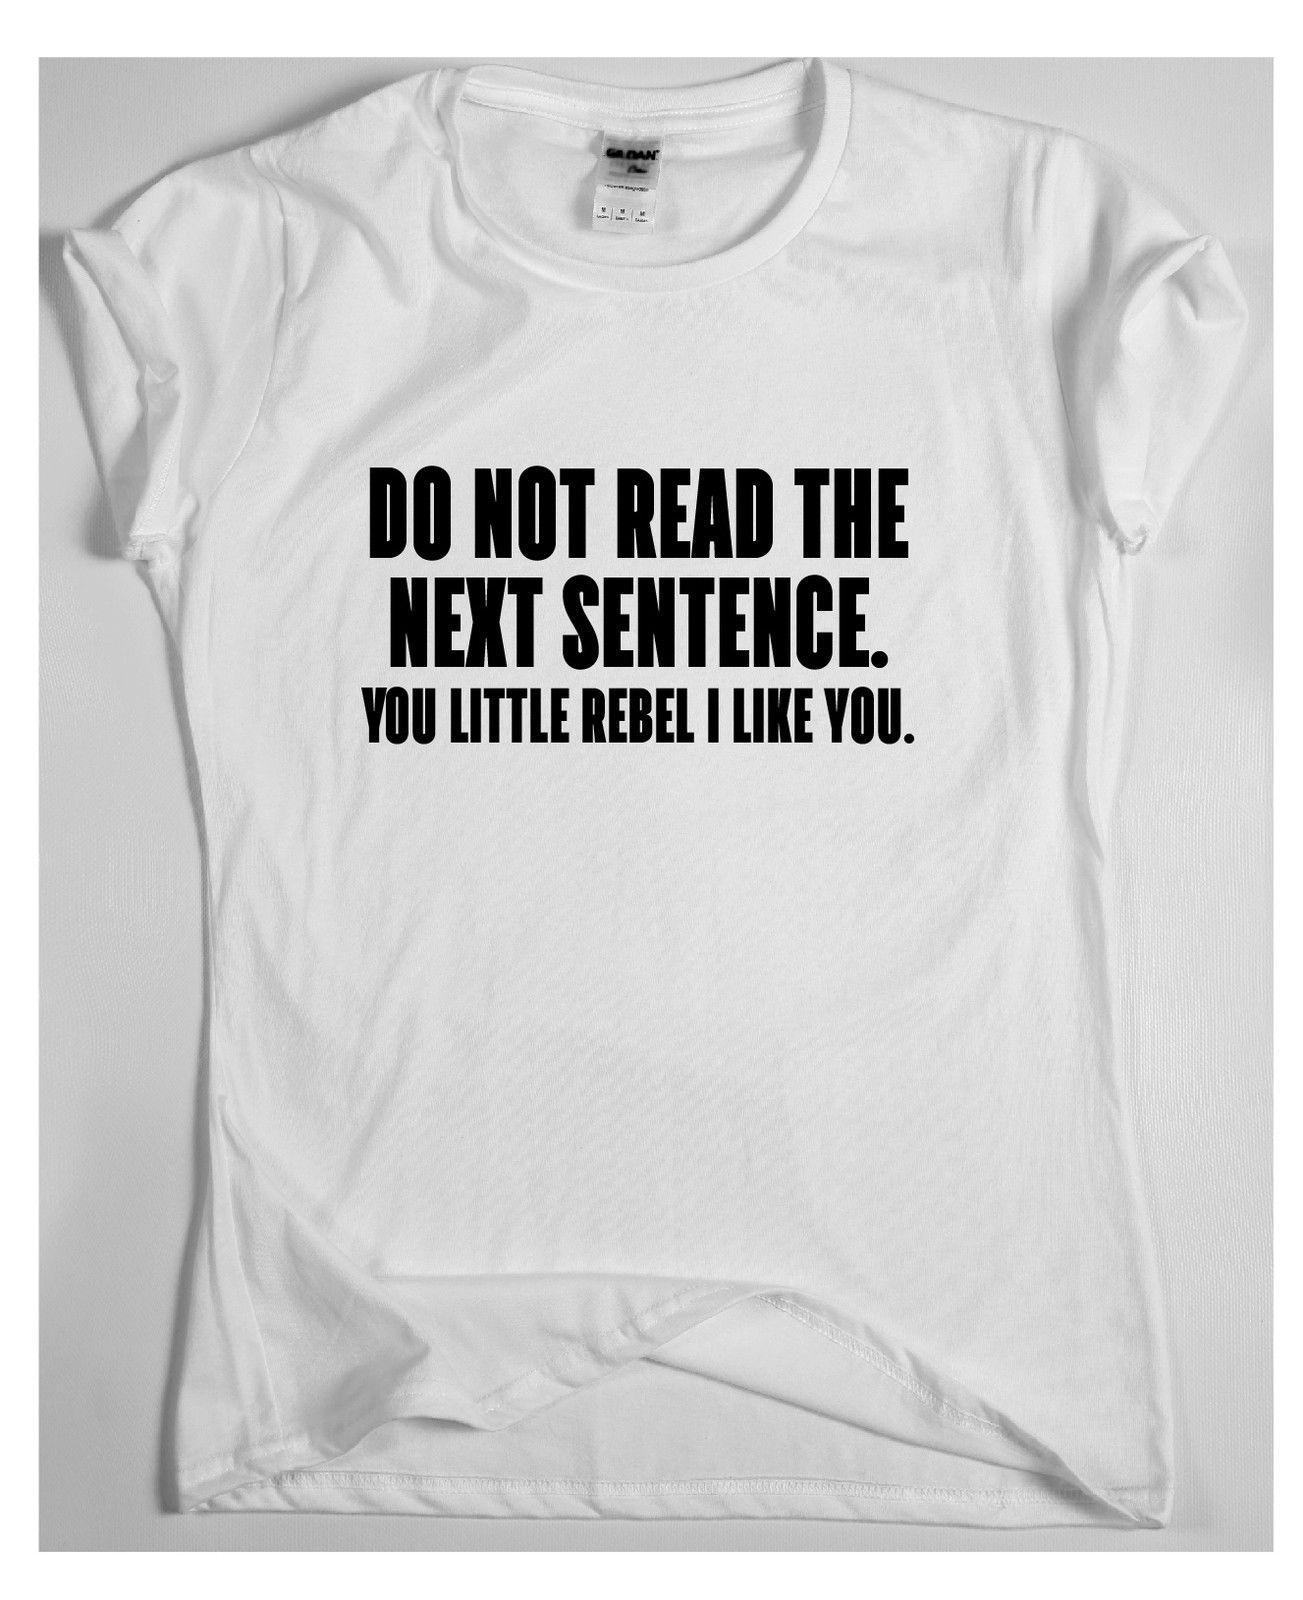 ba644ca6a Compre No Leas La Siguiente Frase  Camisetas Divertidas Para Hombre Humor  Para Mujer Sarcástica Superior Estilo De Moda Para Hombres Camiseta 2019  Camiseta ...